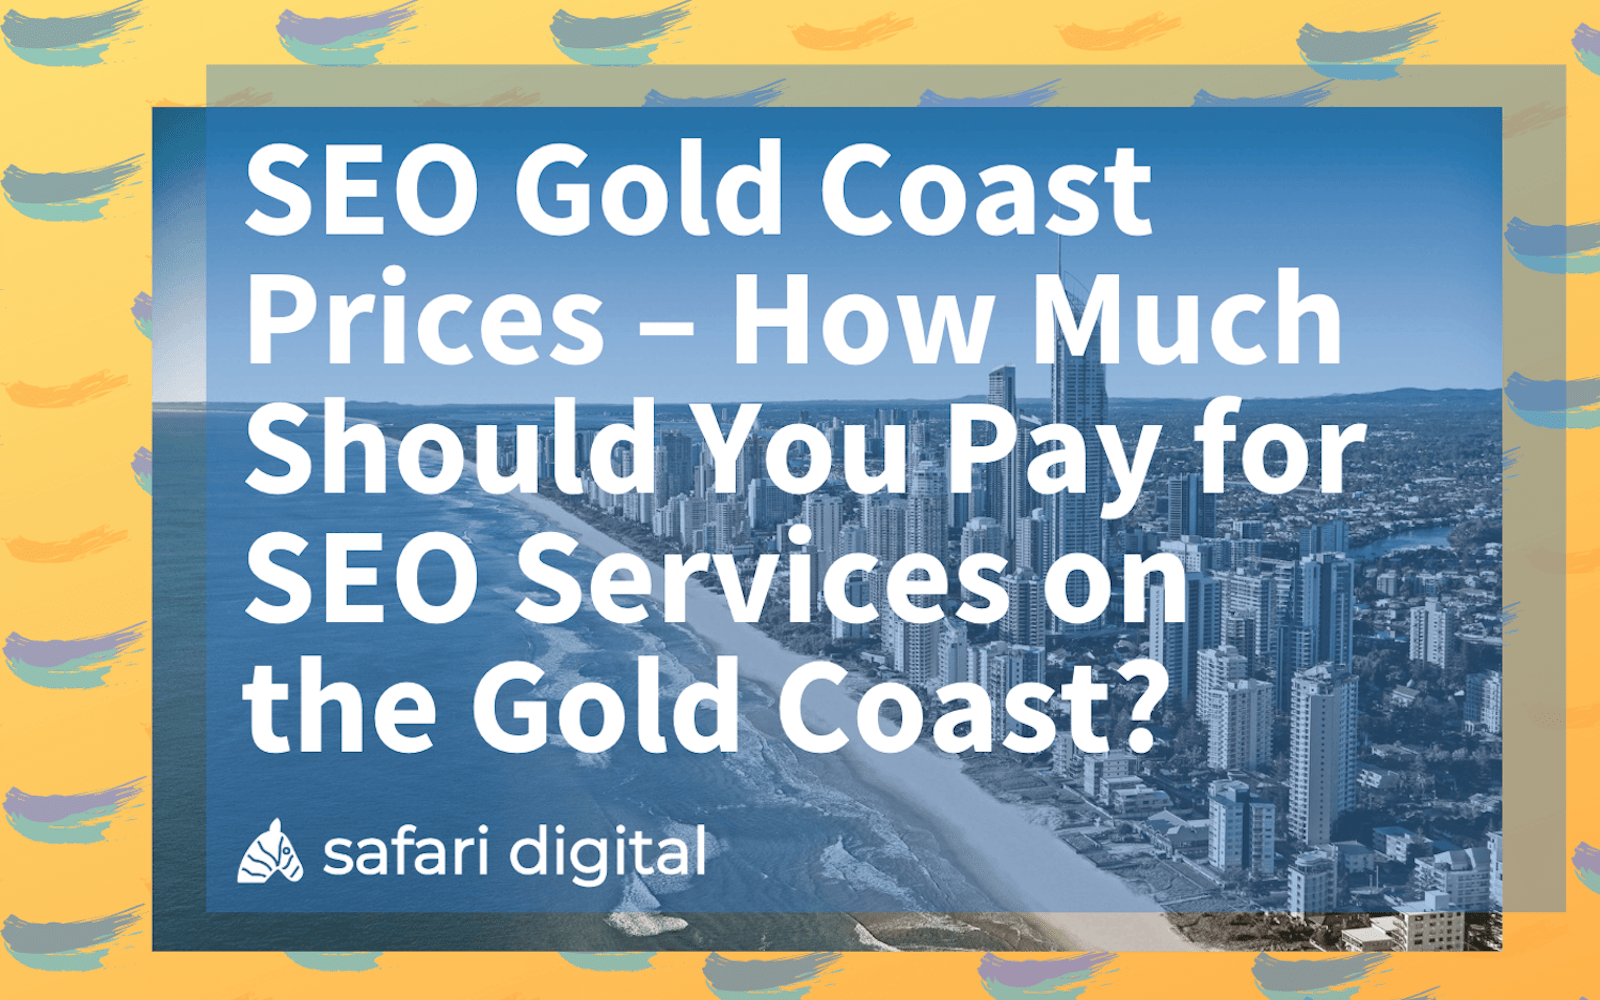 SEO Gold Coast Prices